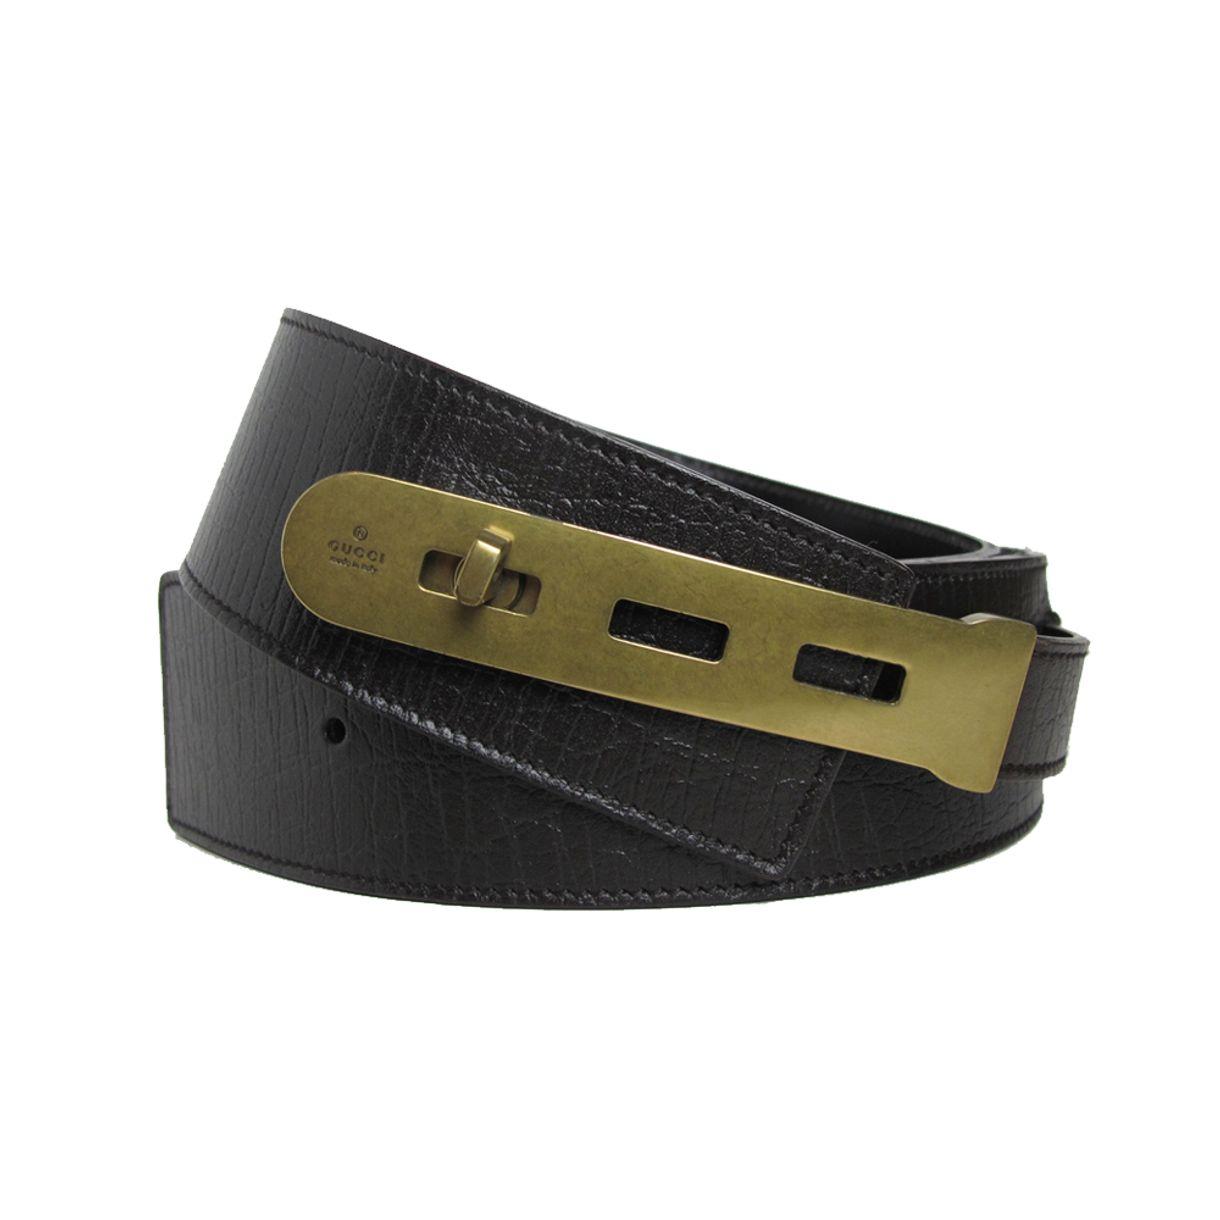 Cinto-Gucci-Leather-Black